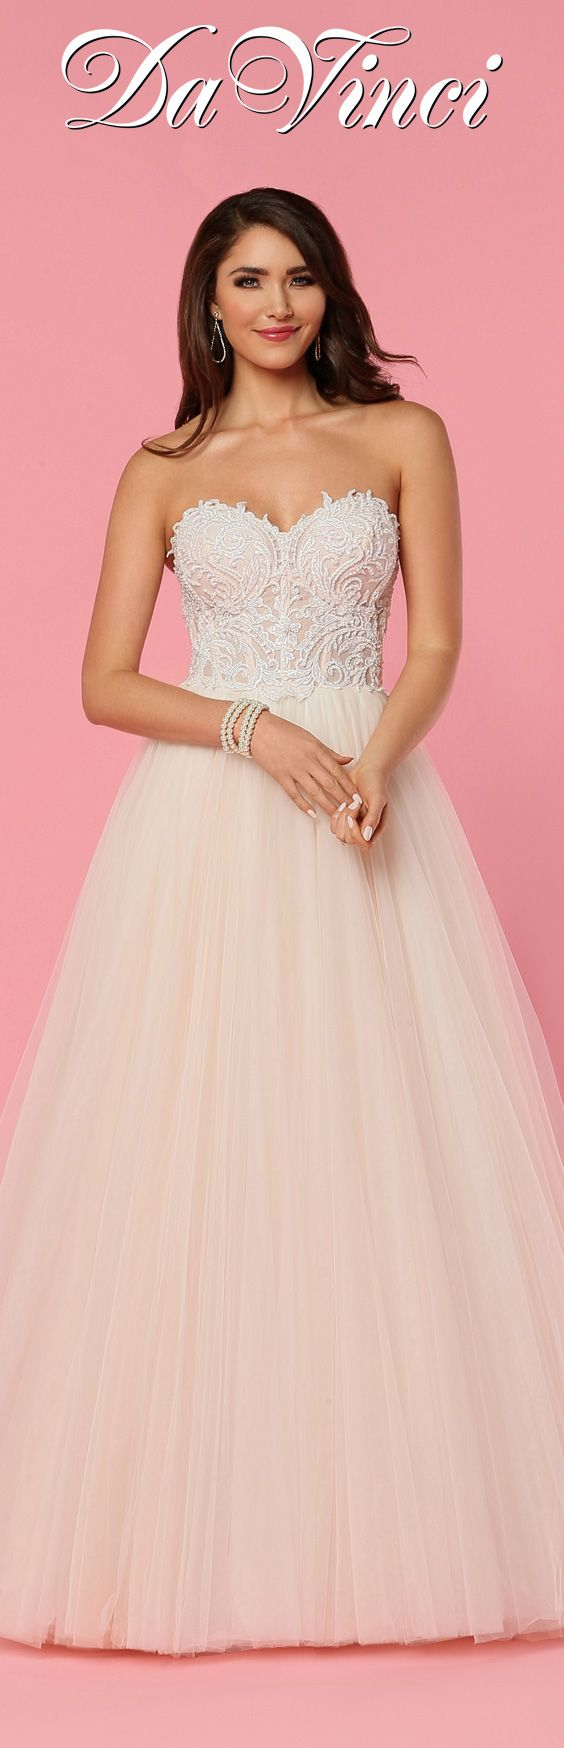 Wedding - DaVinci Bridal